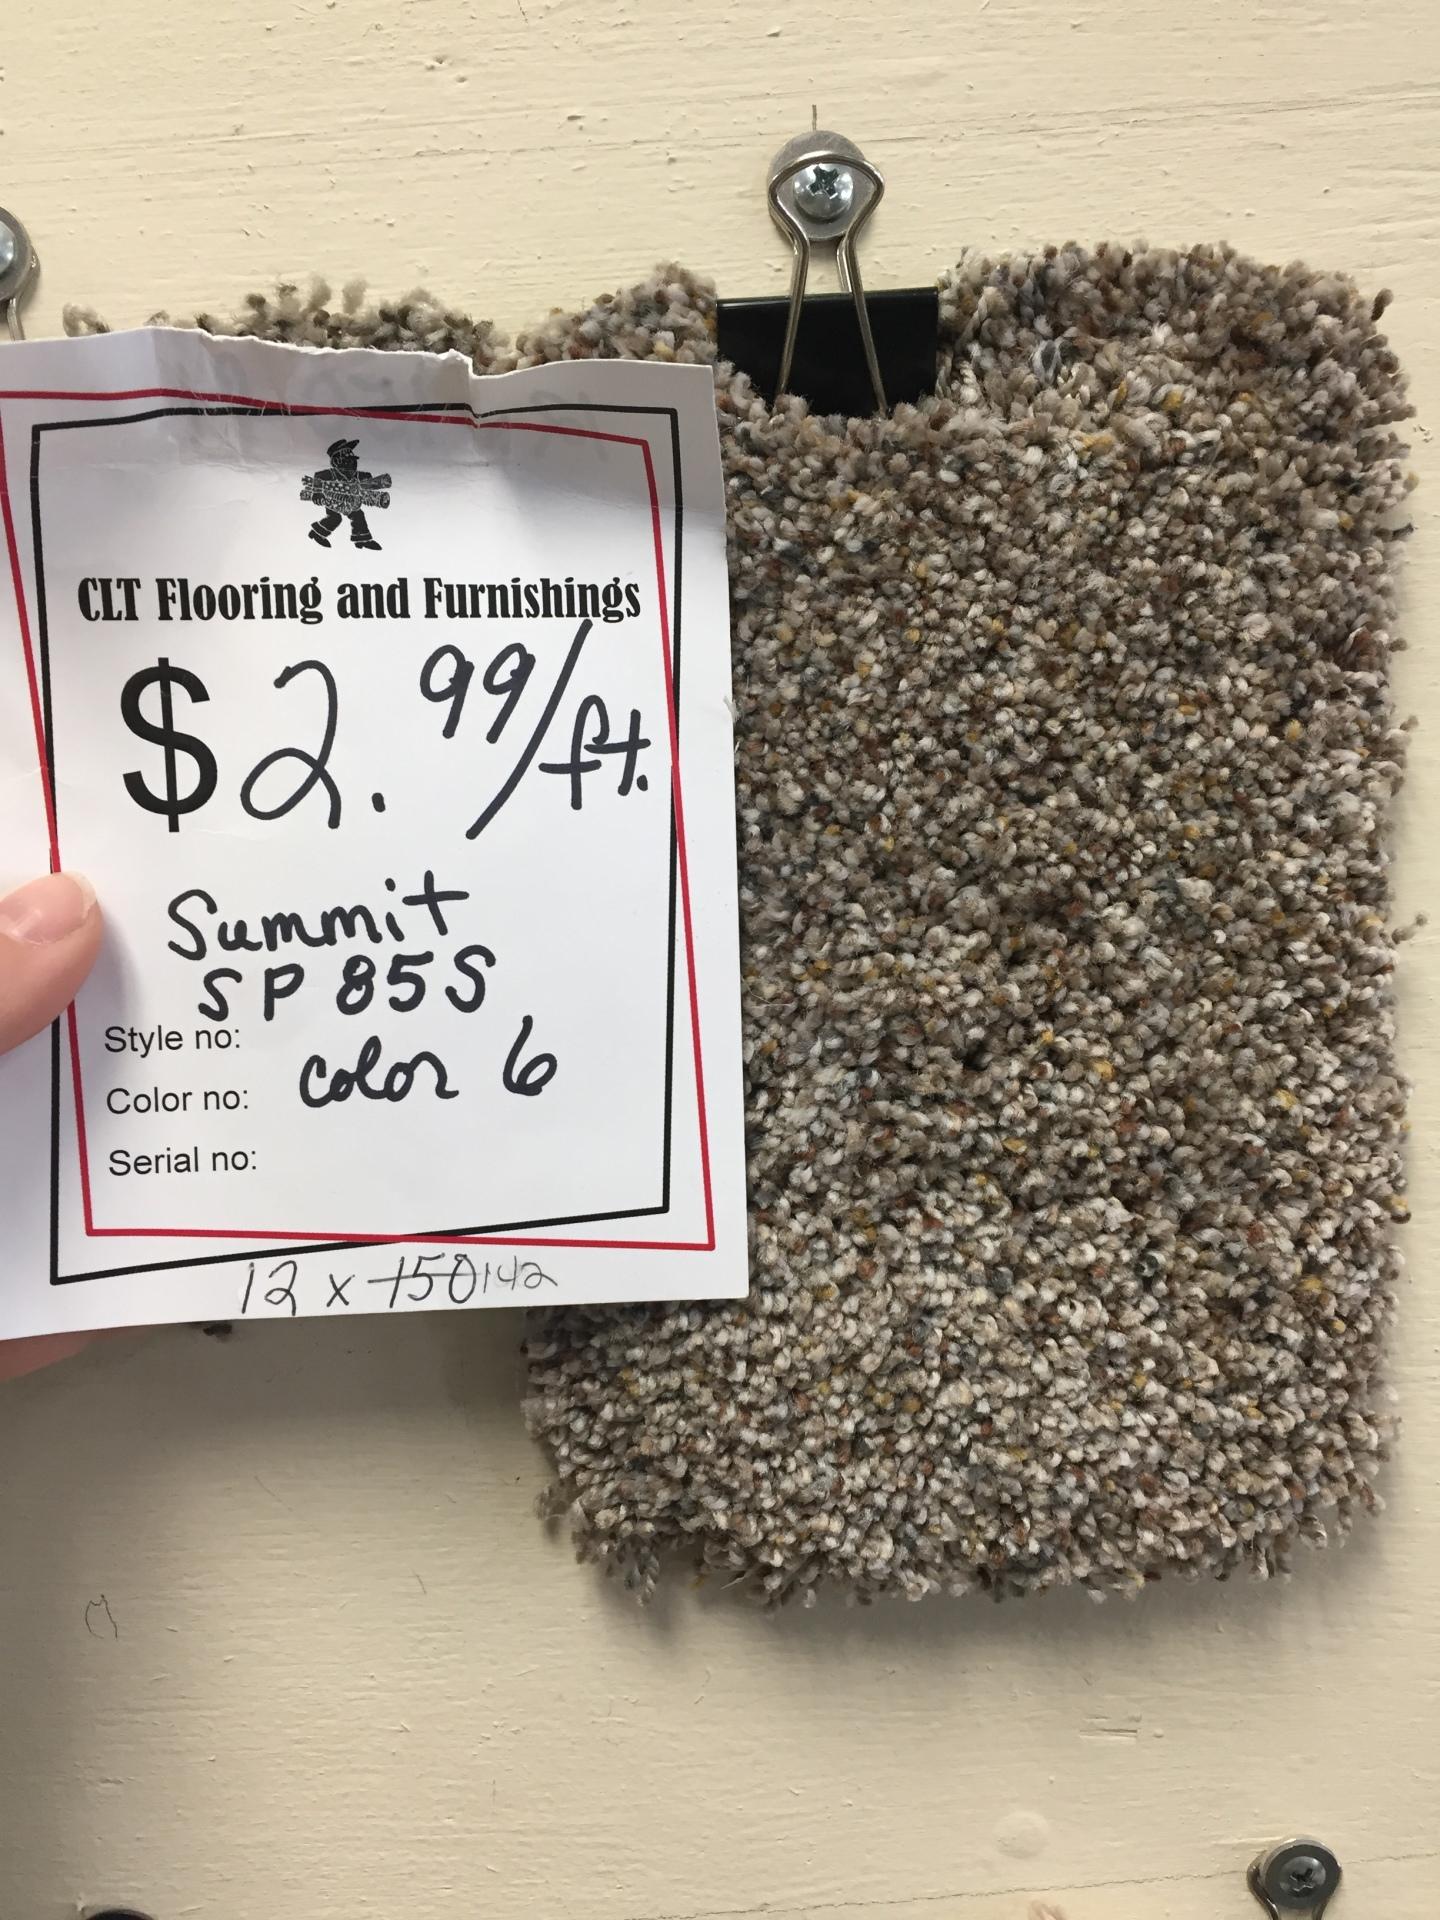 SUMMIT SP85S $2.99 SF